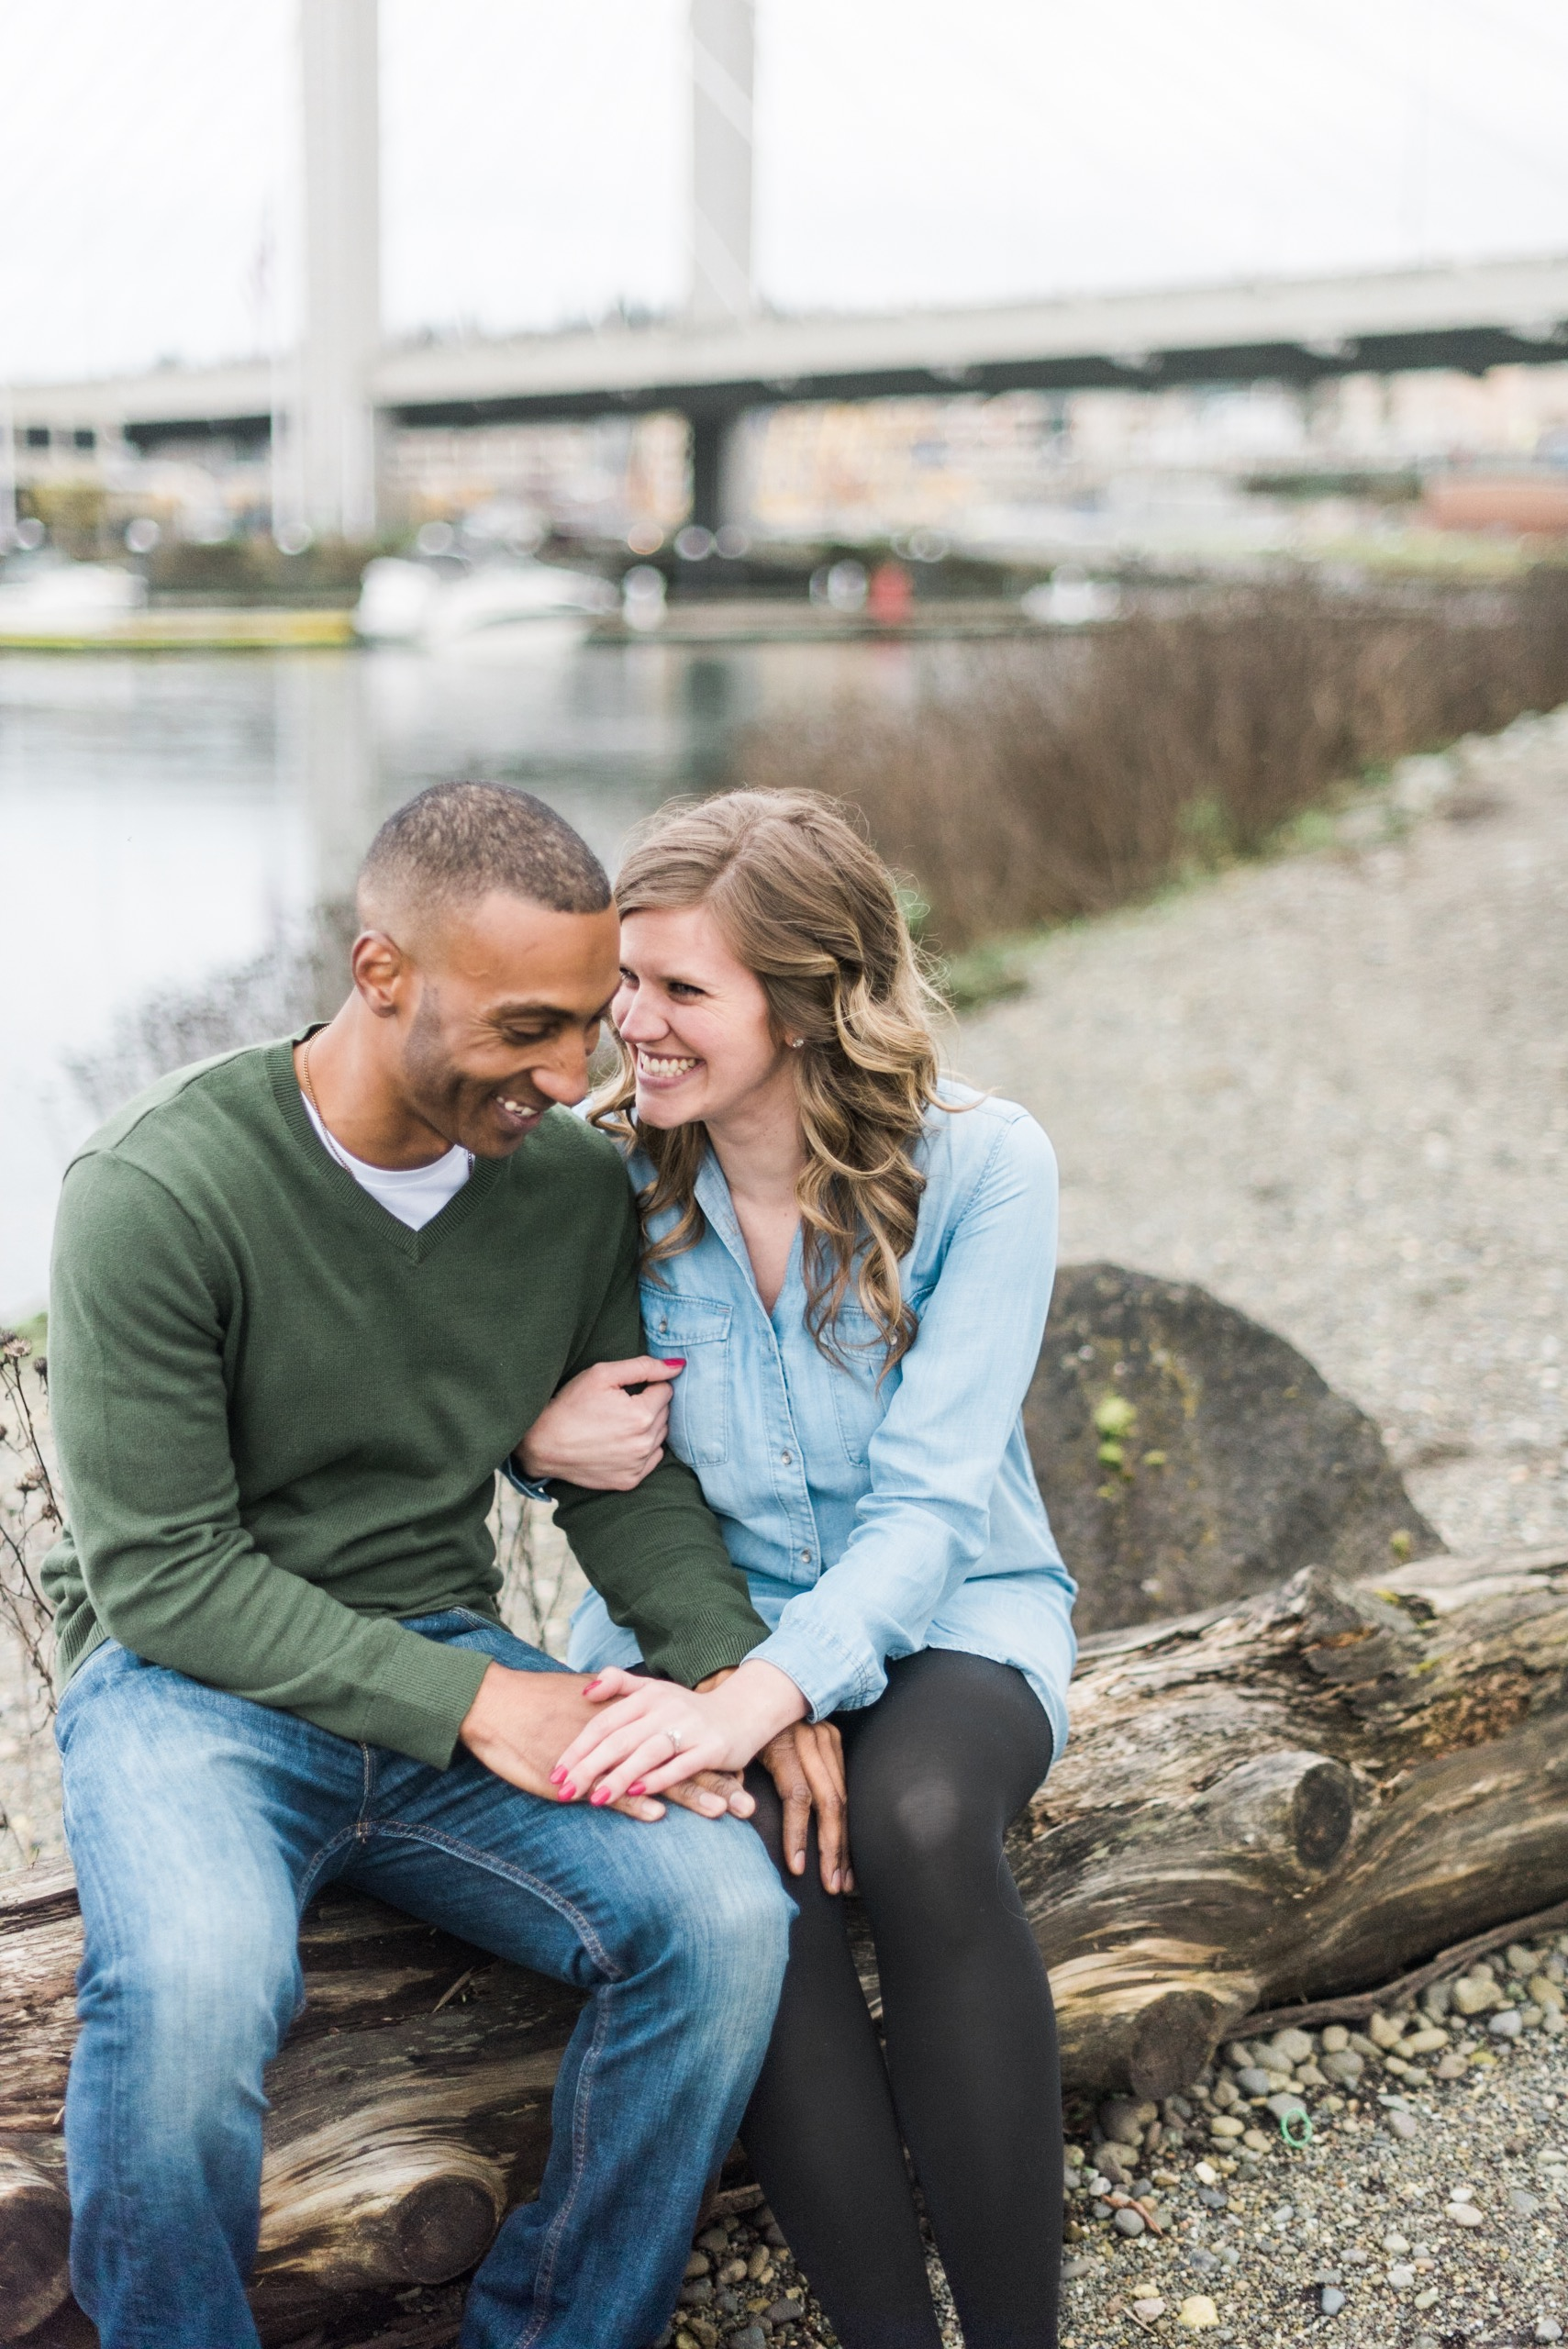 Brooke Summers Photography | Courtney + Devon Engagement